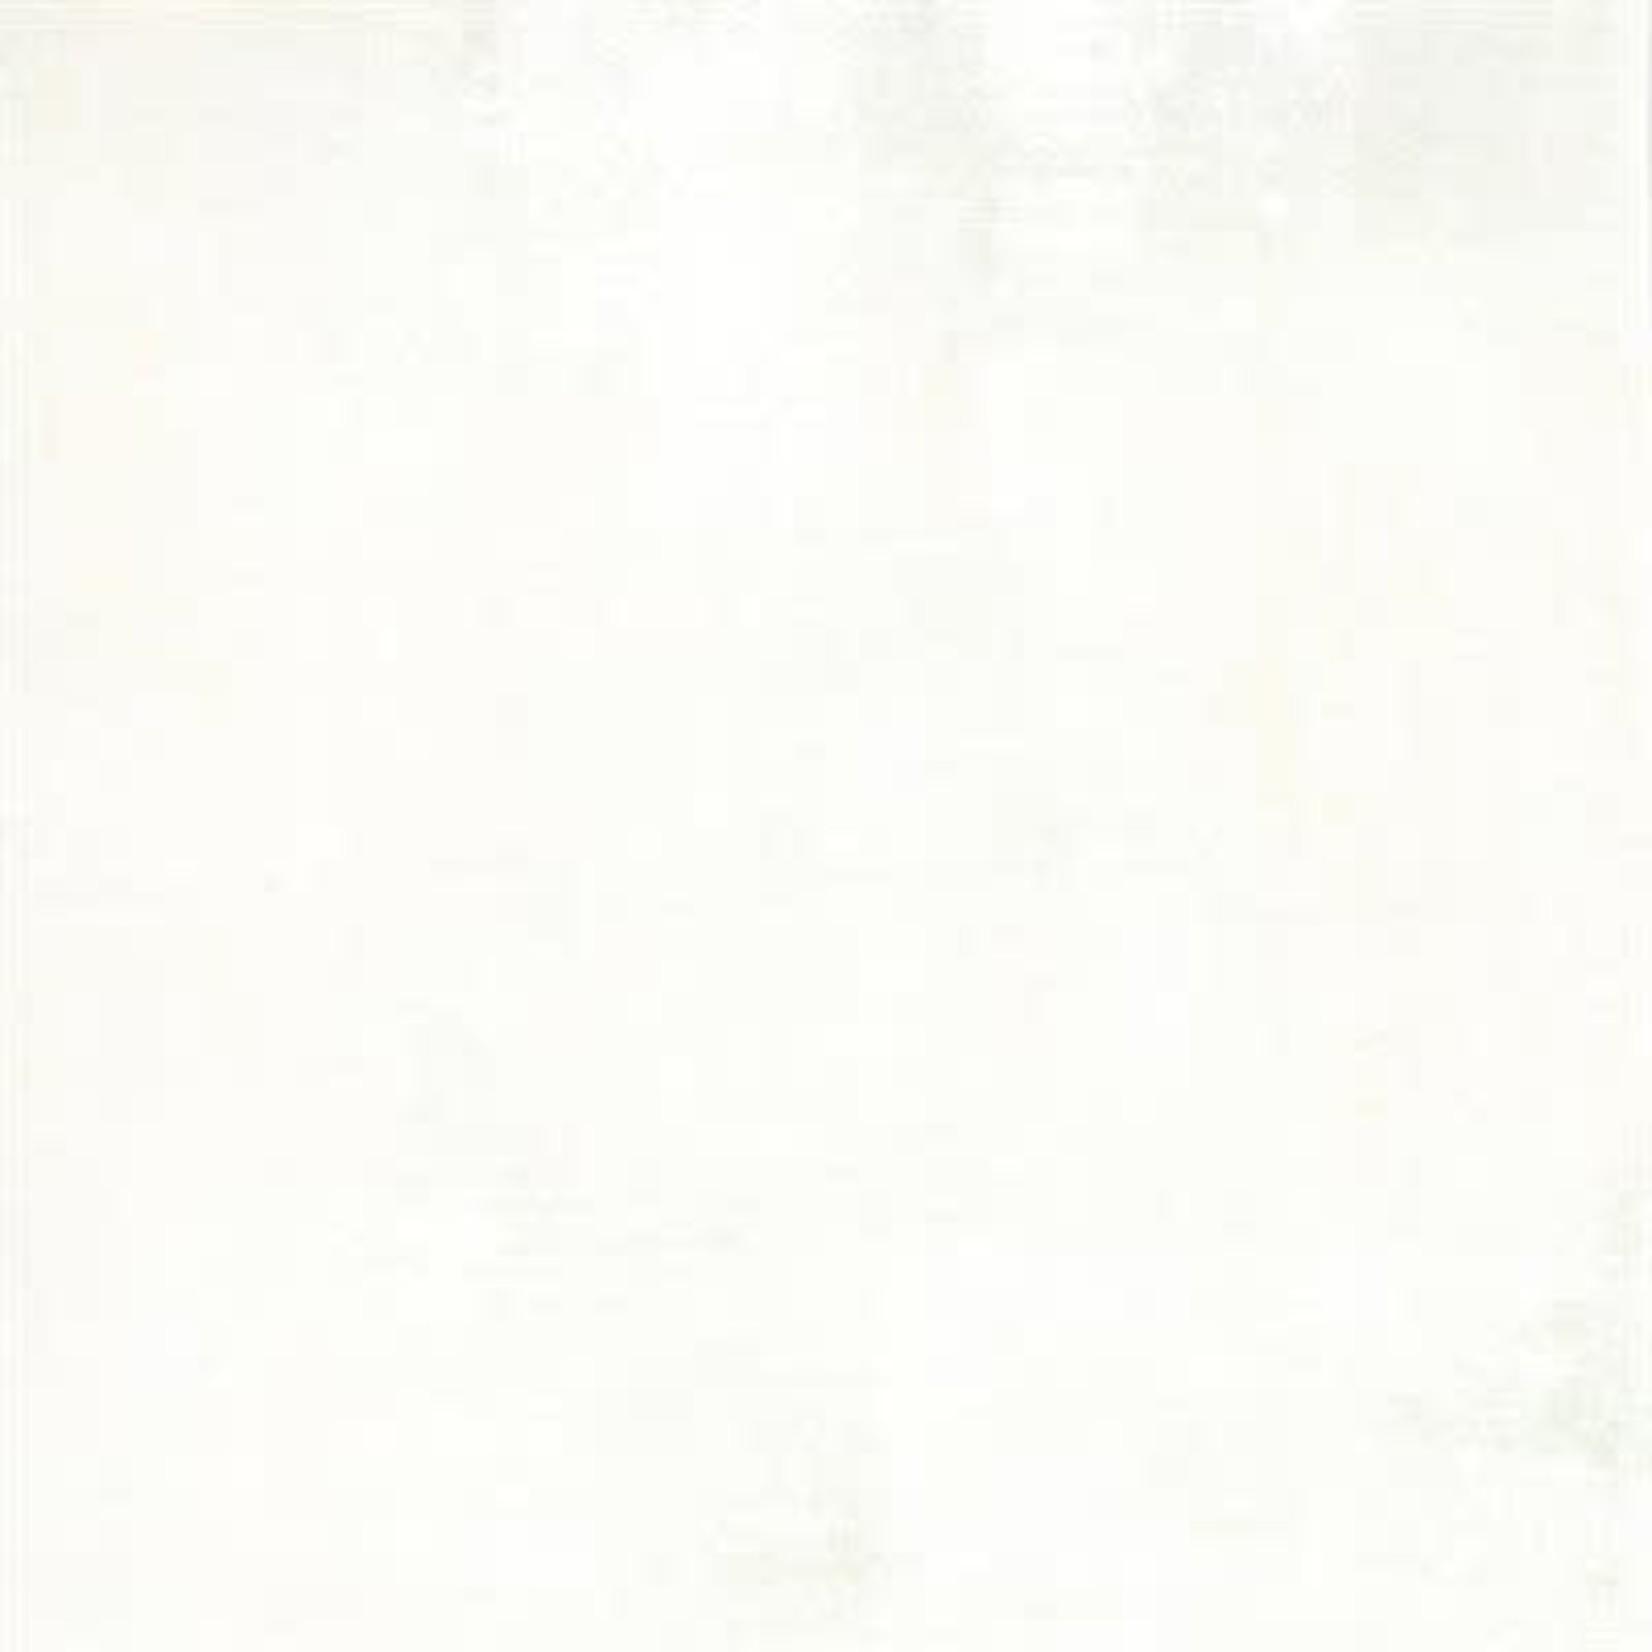 Moda Grunge Basics Grunge - Essence per cm or $20/m